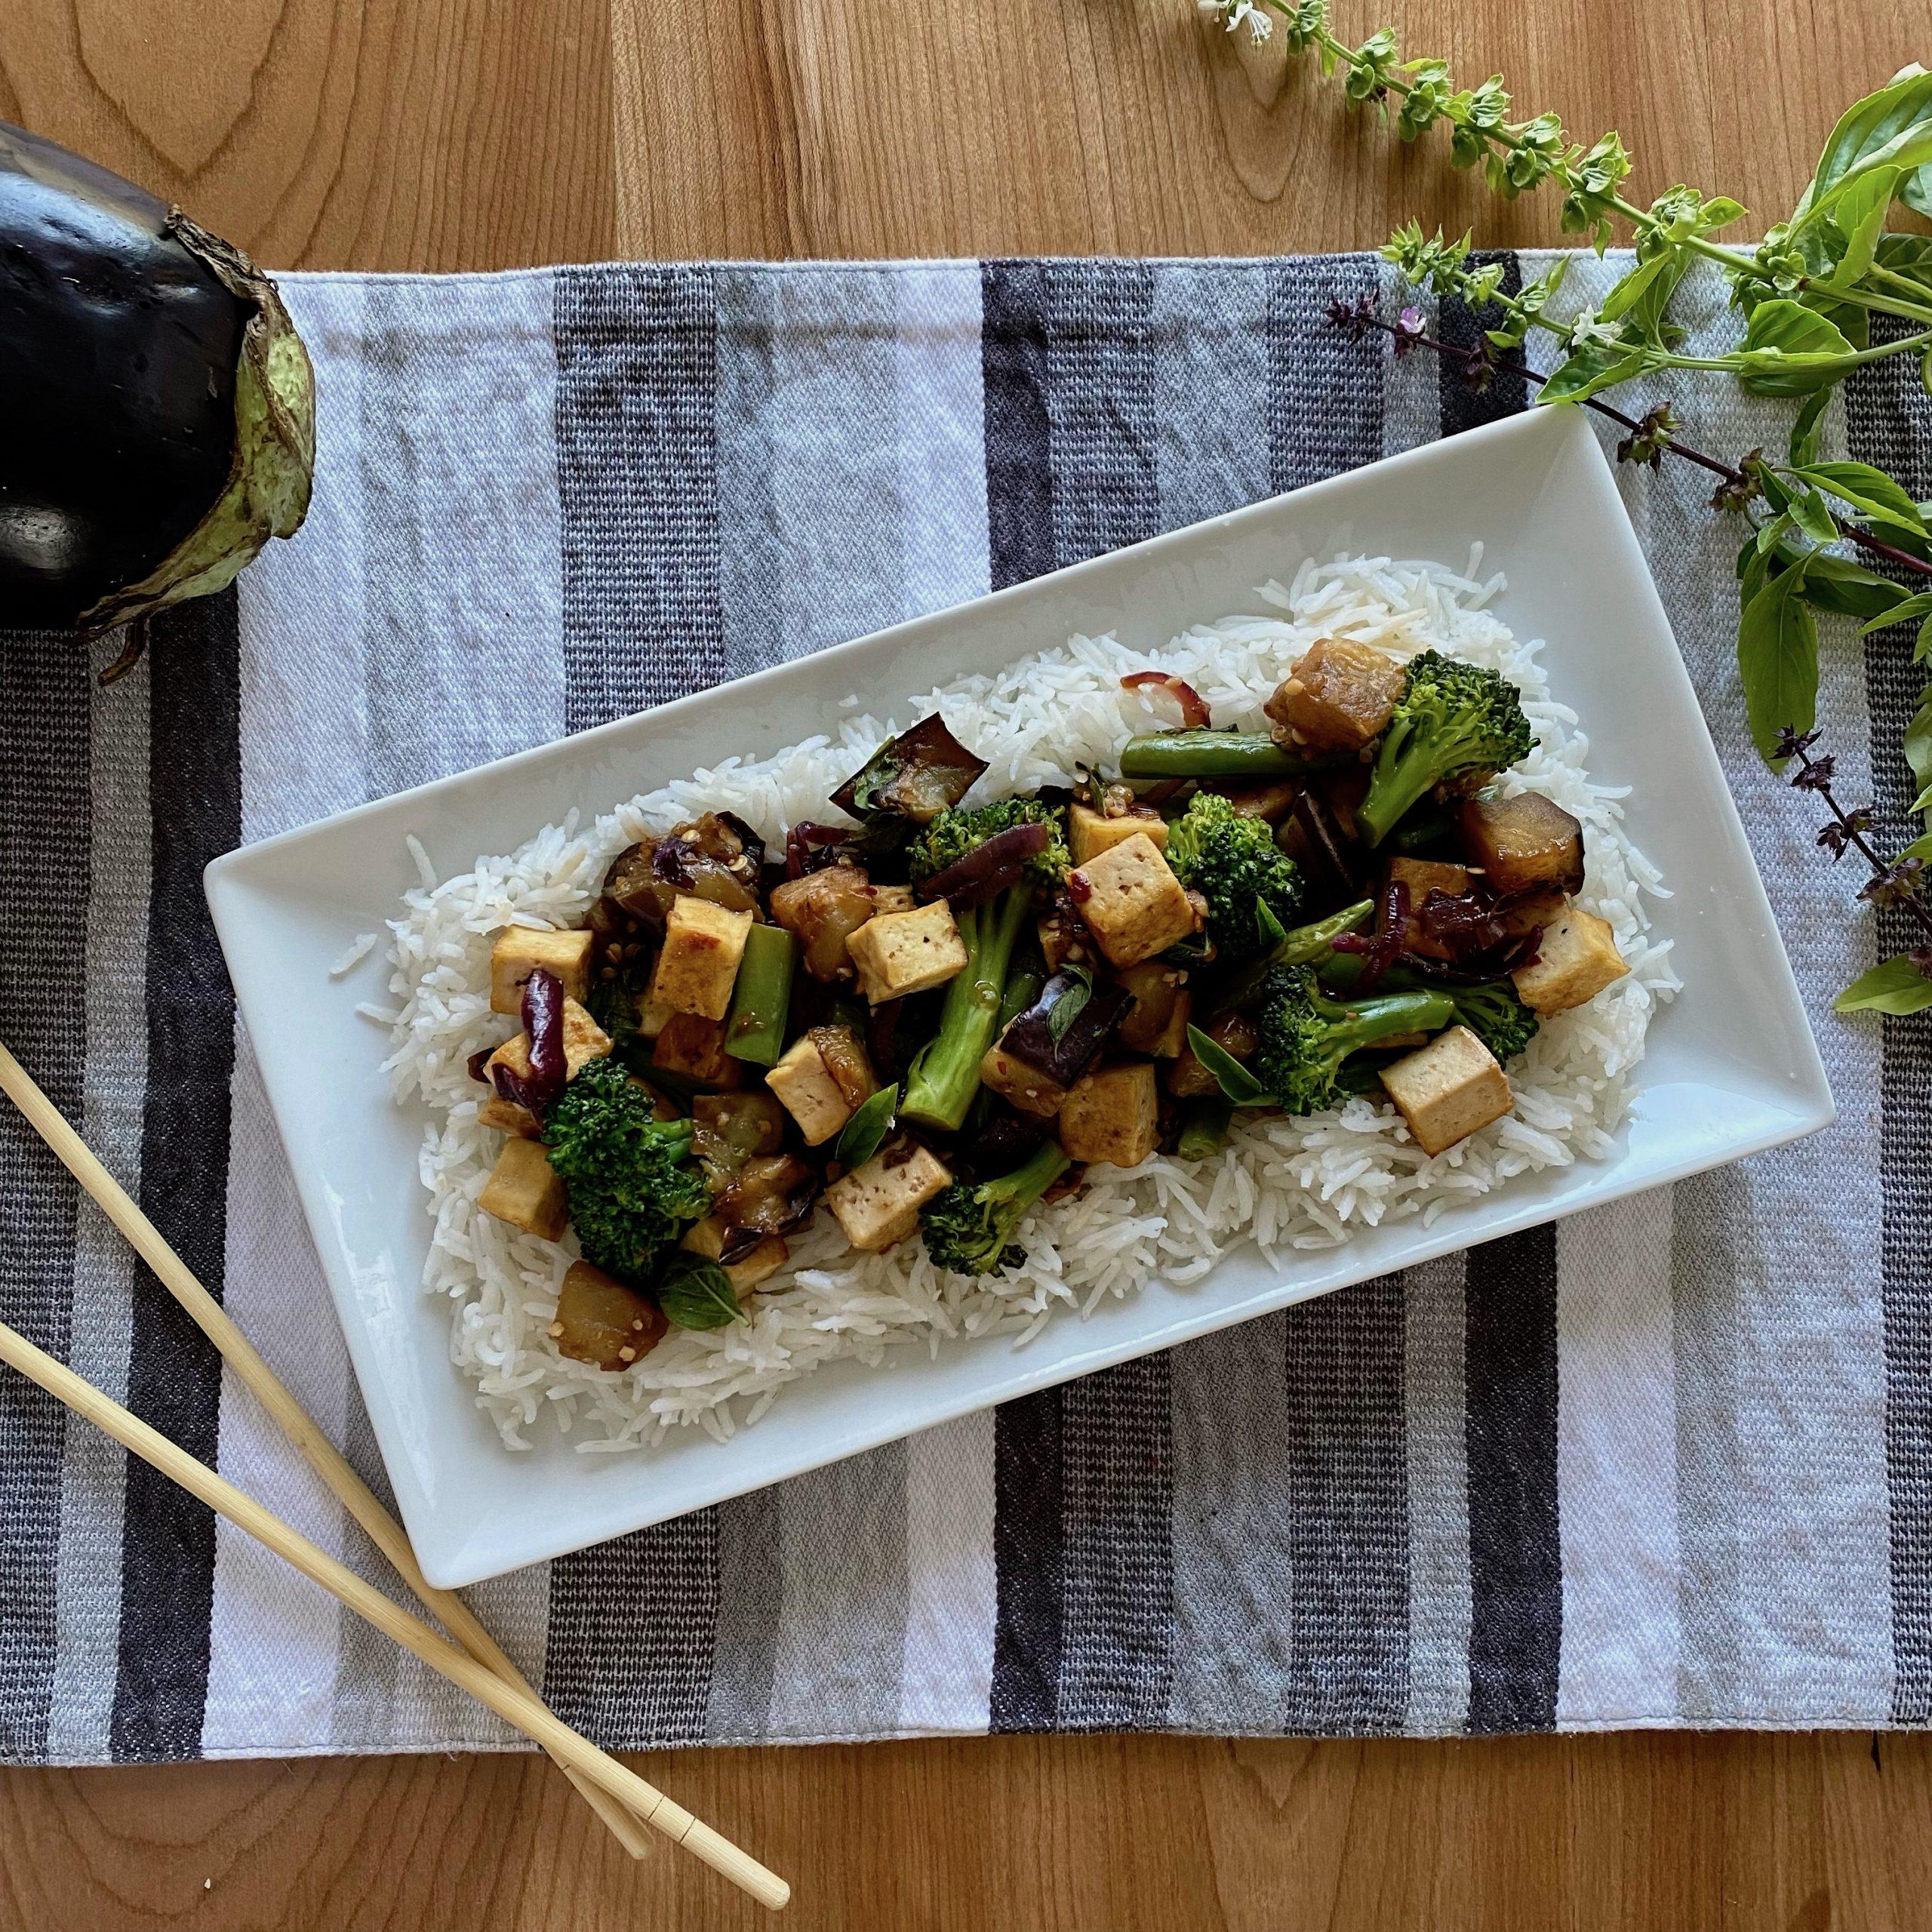 Sauté thaï au tofu, aubergine et basilic